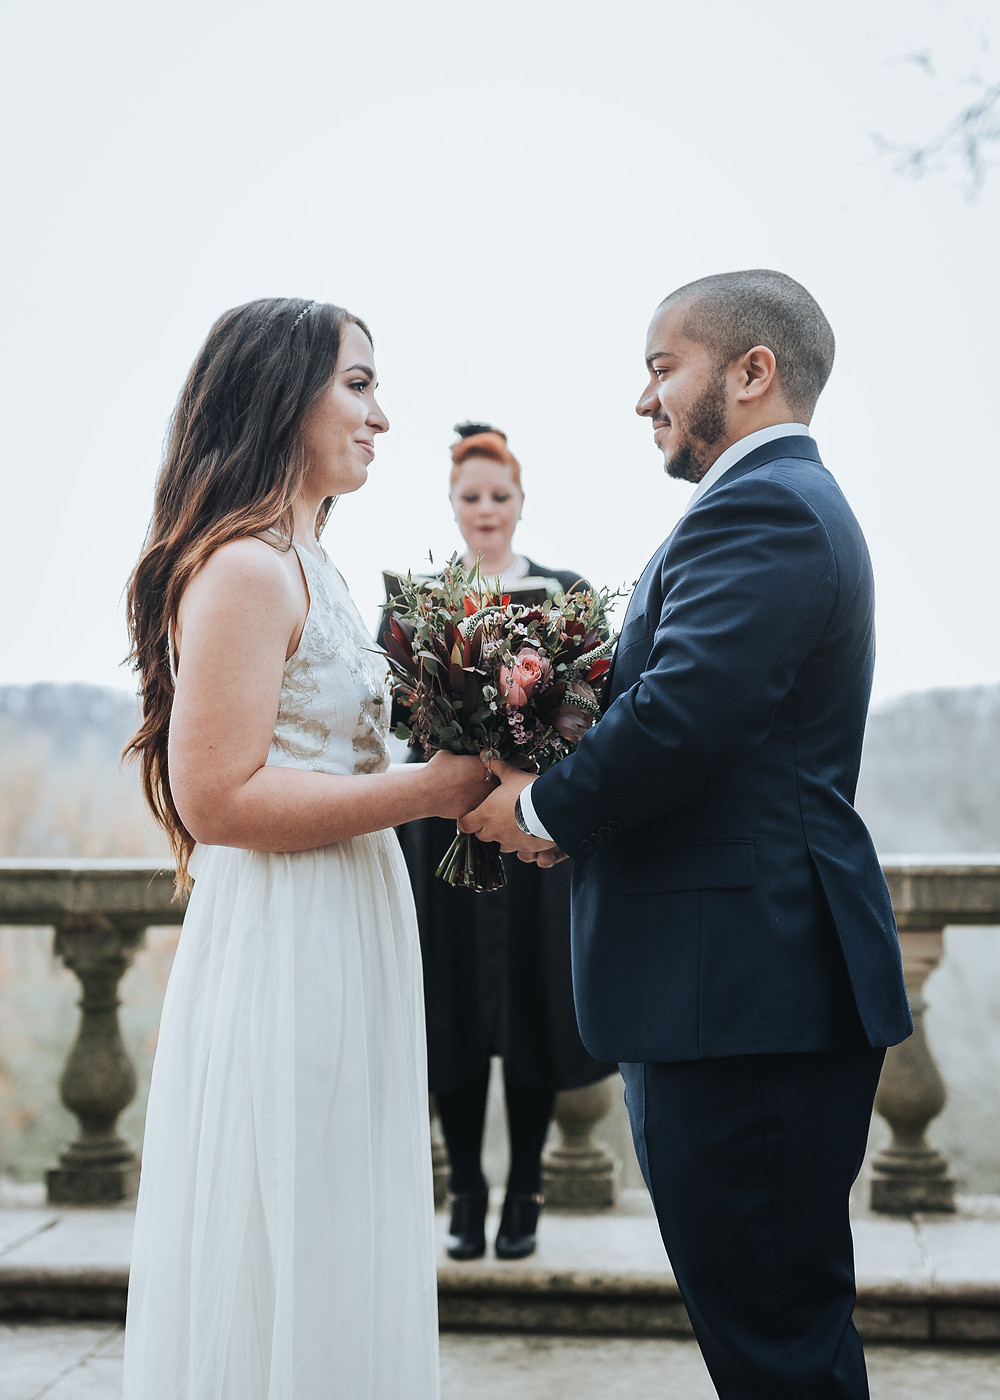 Wedding at Cheekwood Mansion, Nashville